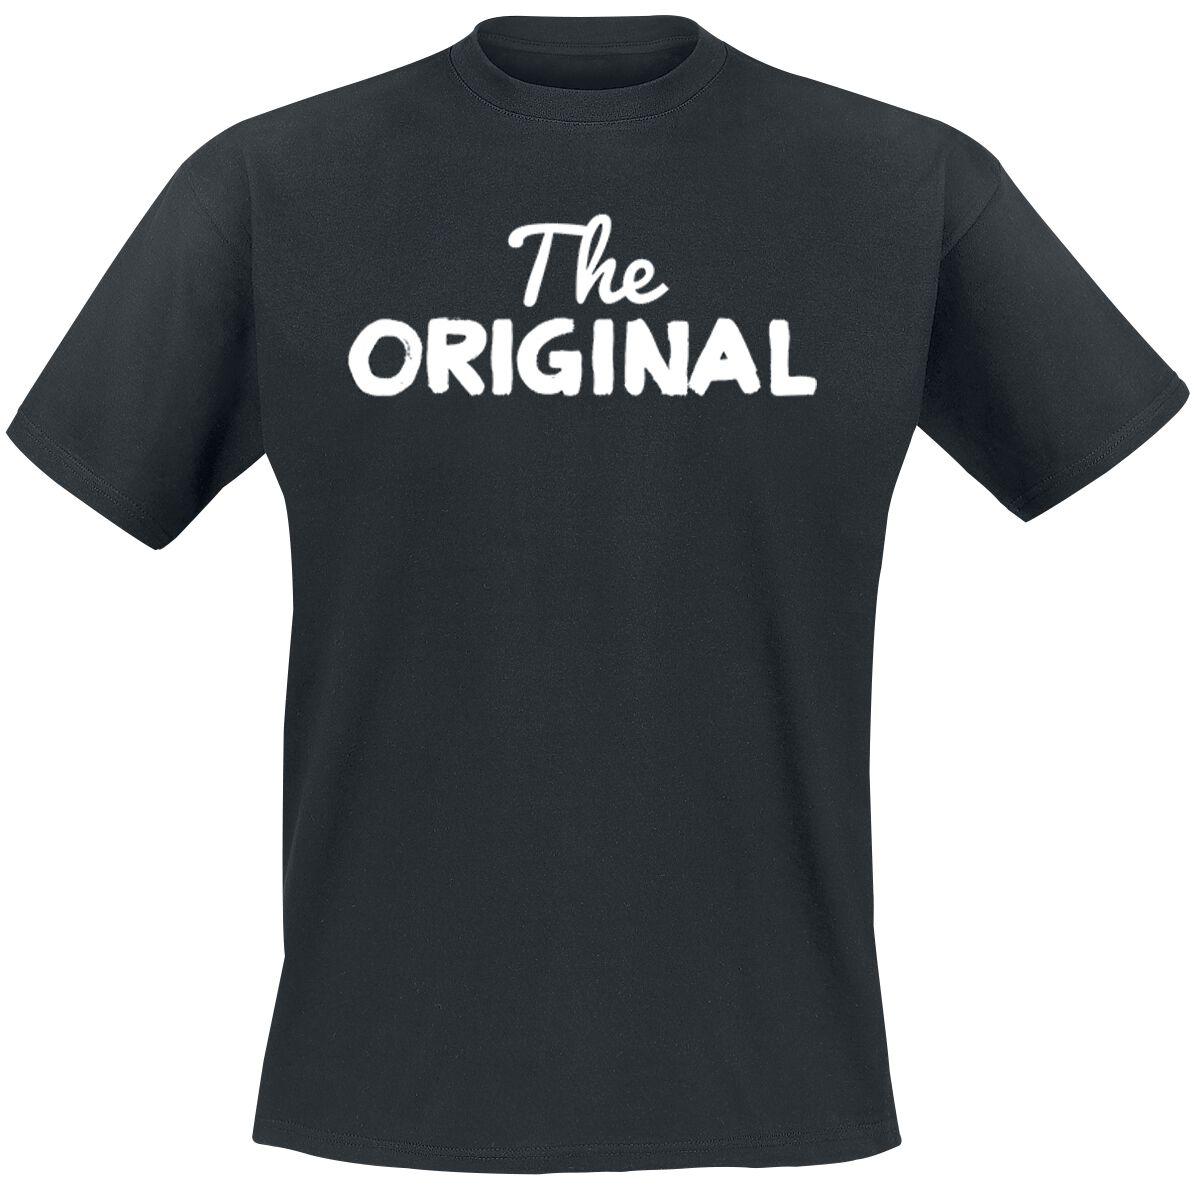 Fun Shirts - Koszulki - T-Shirt Family The Original T-Shirt czarny - 365120